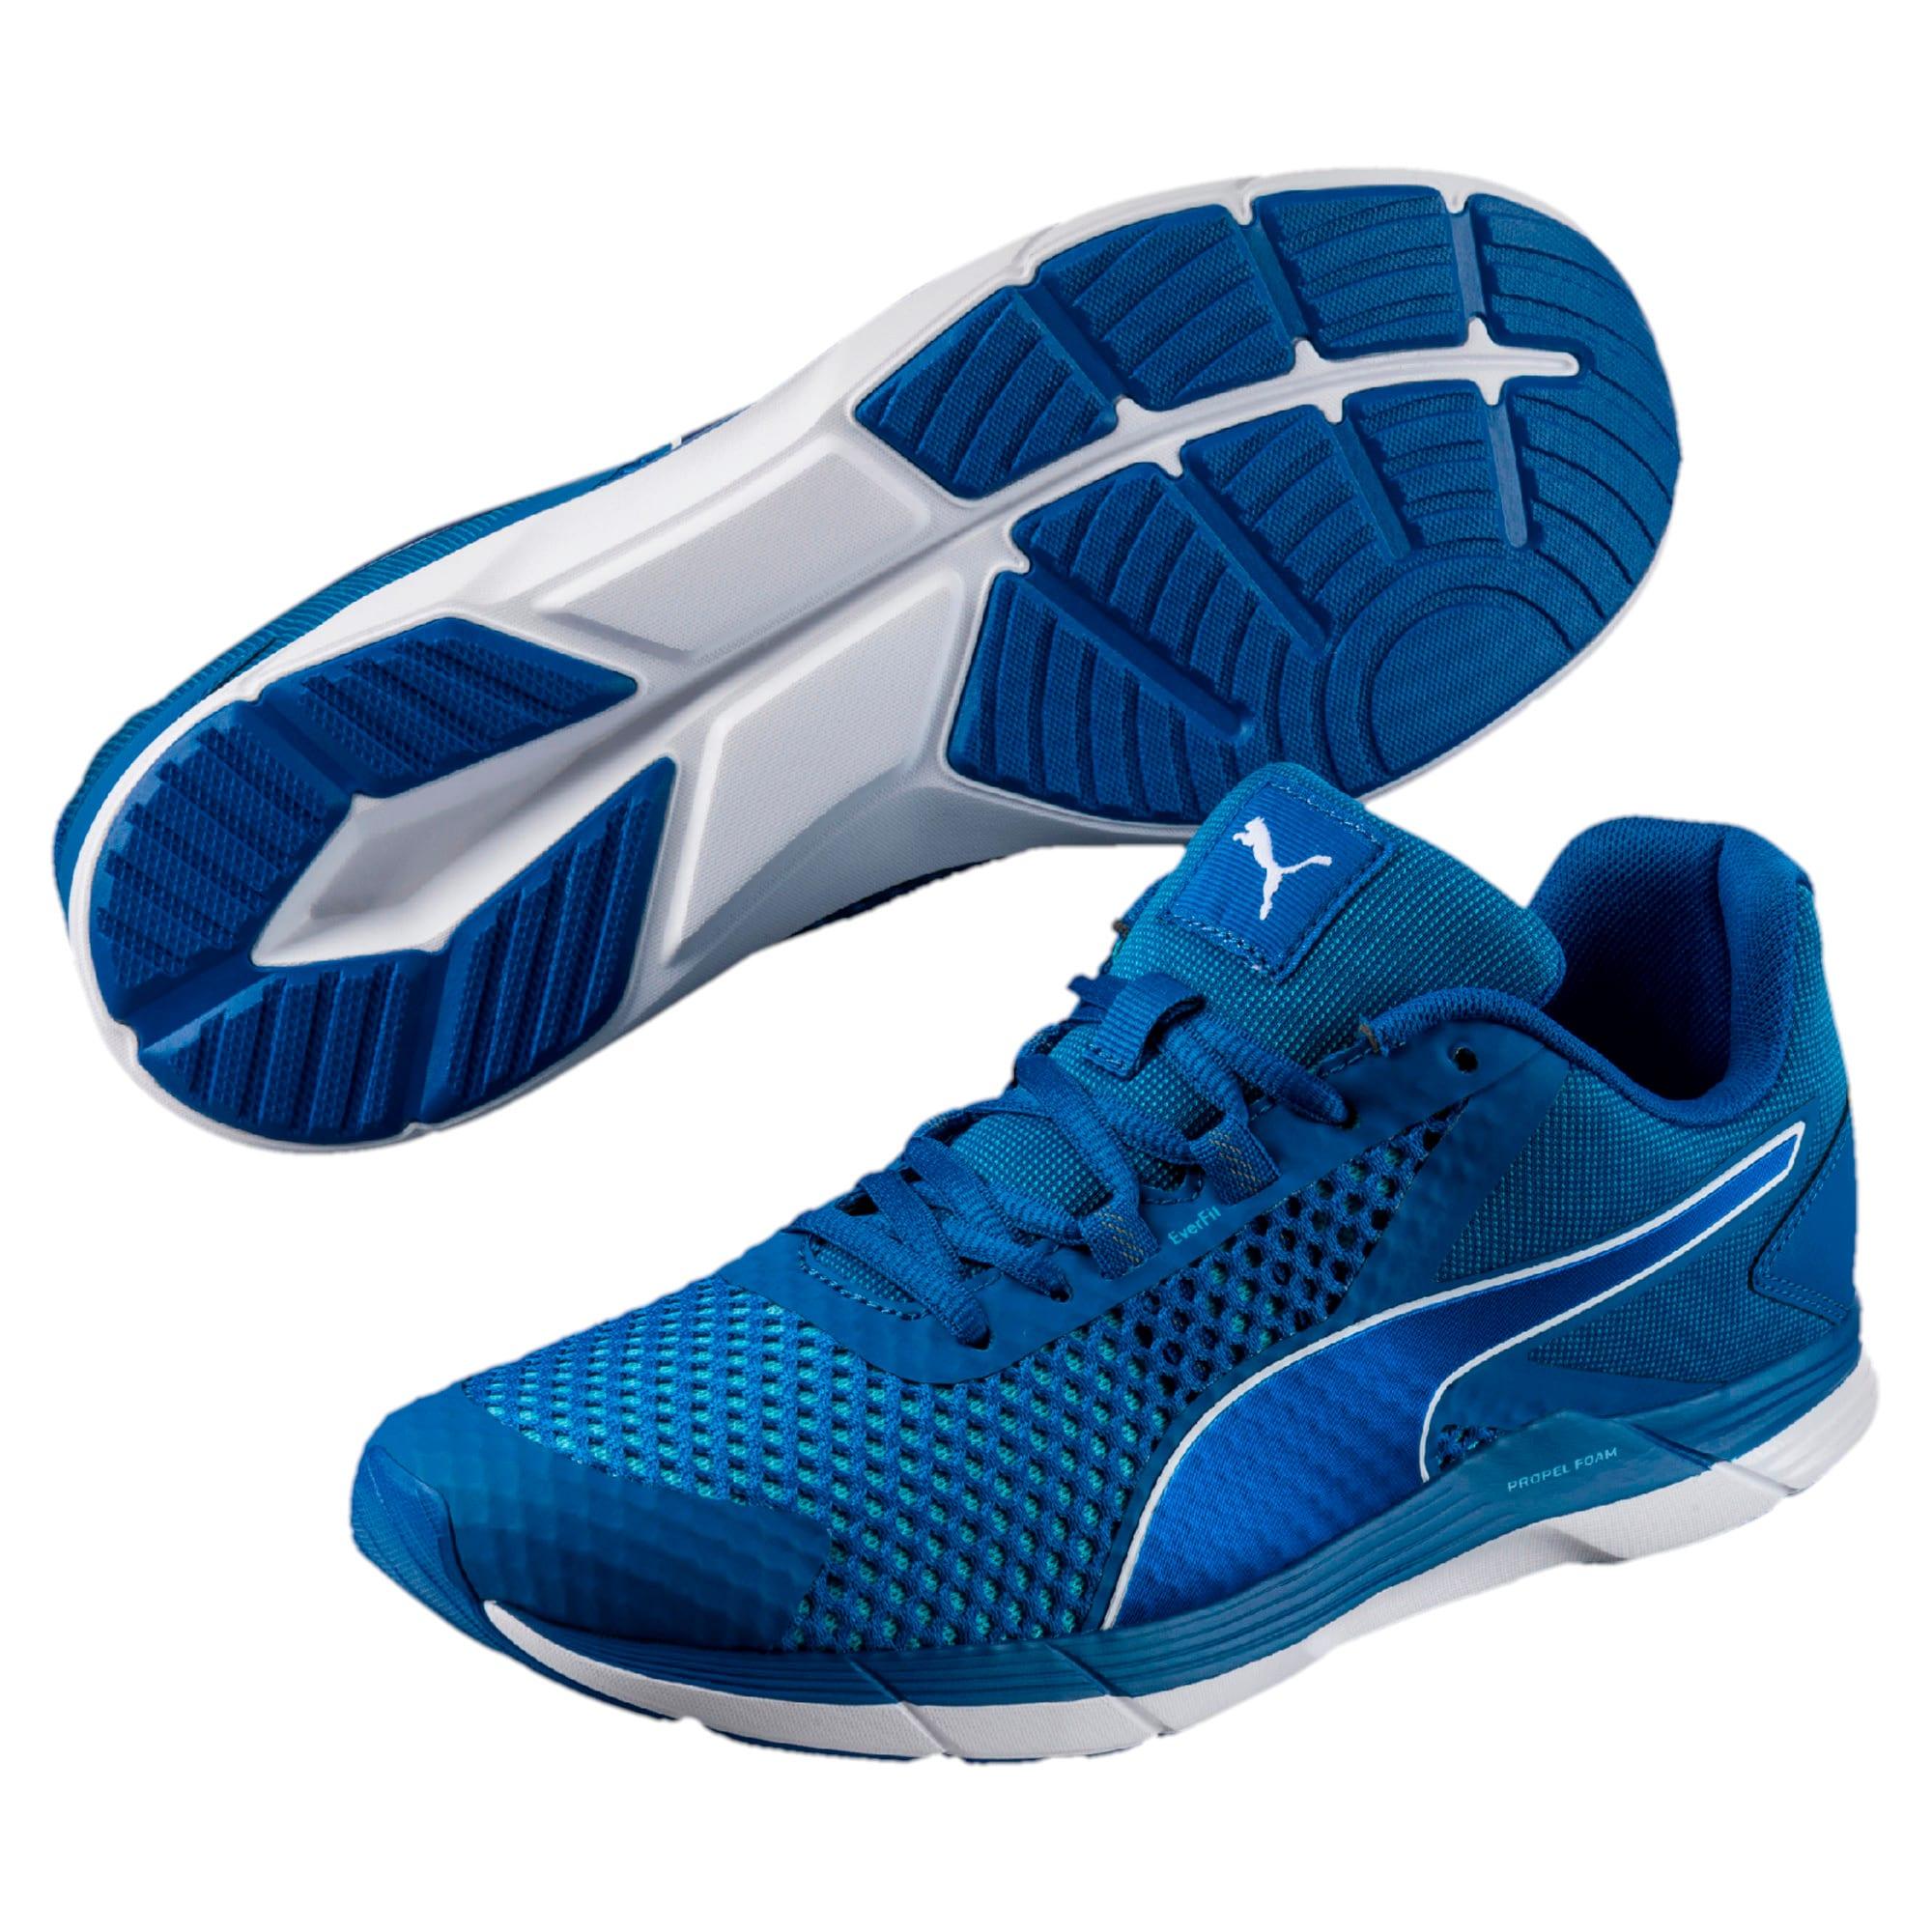 Thumbnail 6 of Propel 2 Men's Running Shoes, Lapis Blue-Turquoise-White, medium-IND